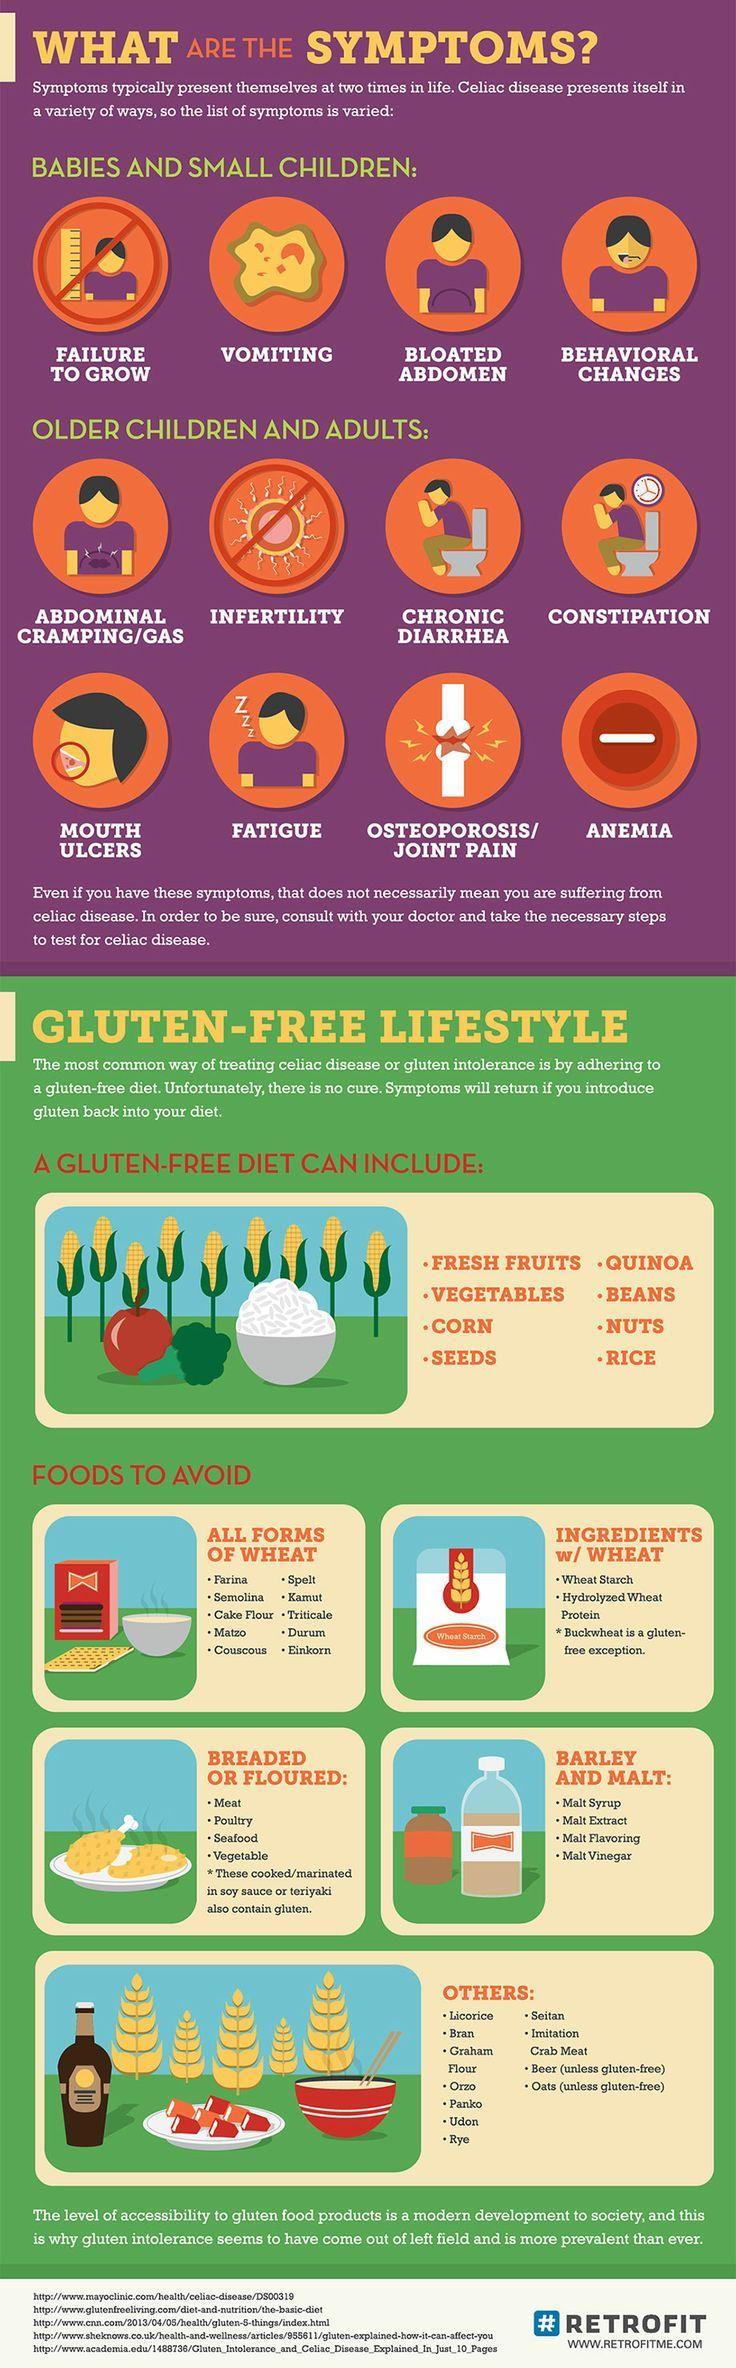 What is Celiac Disease and it's Symptoms?